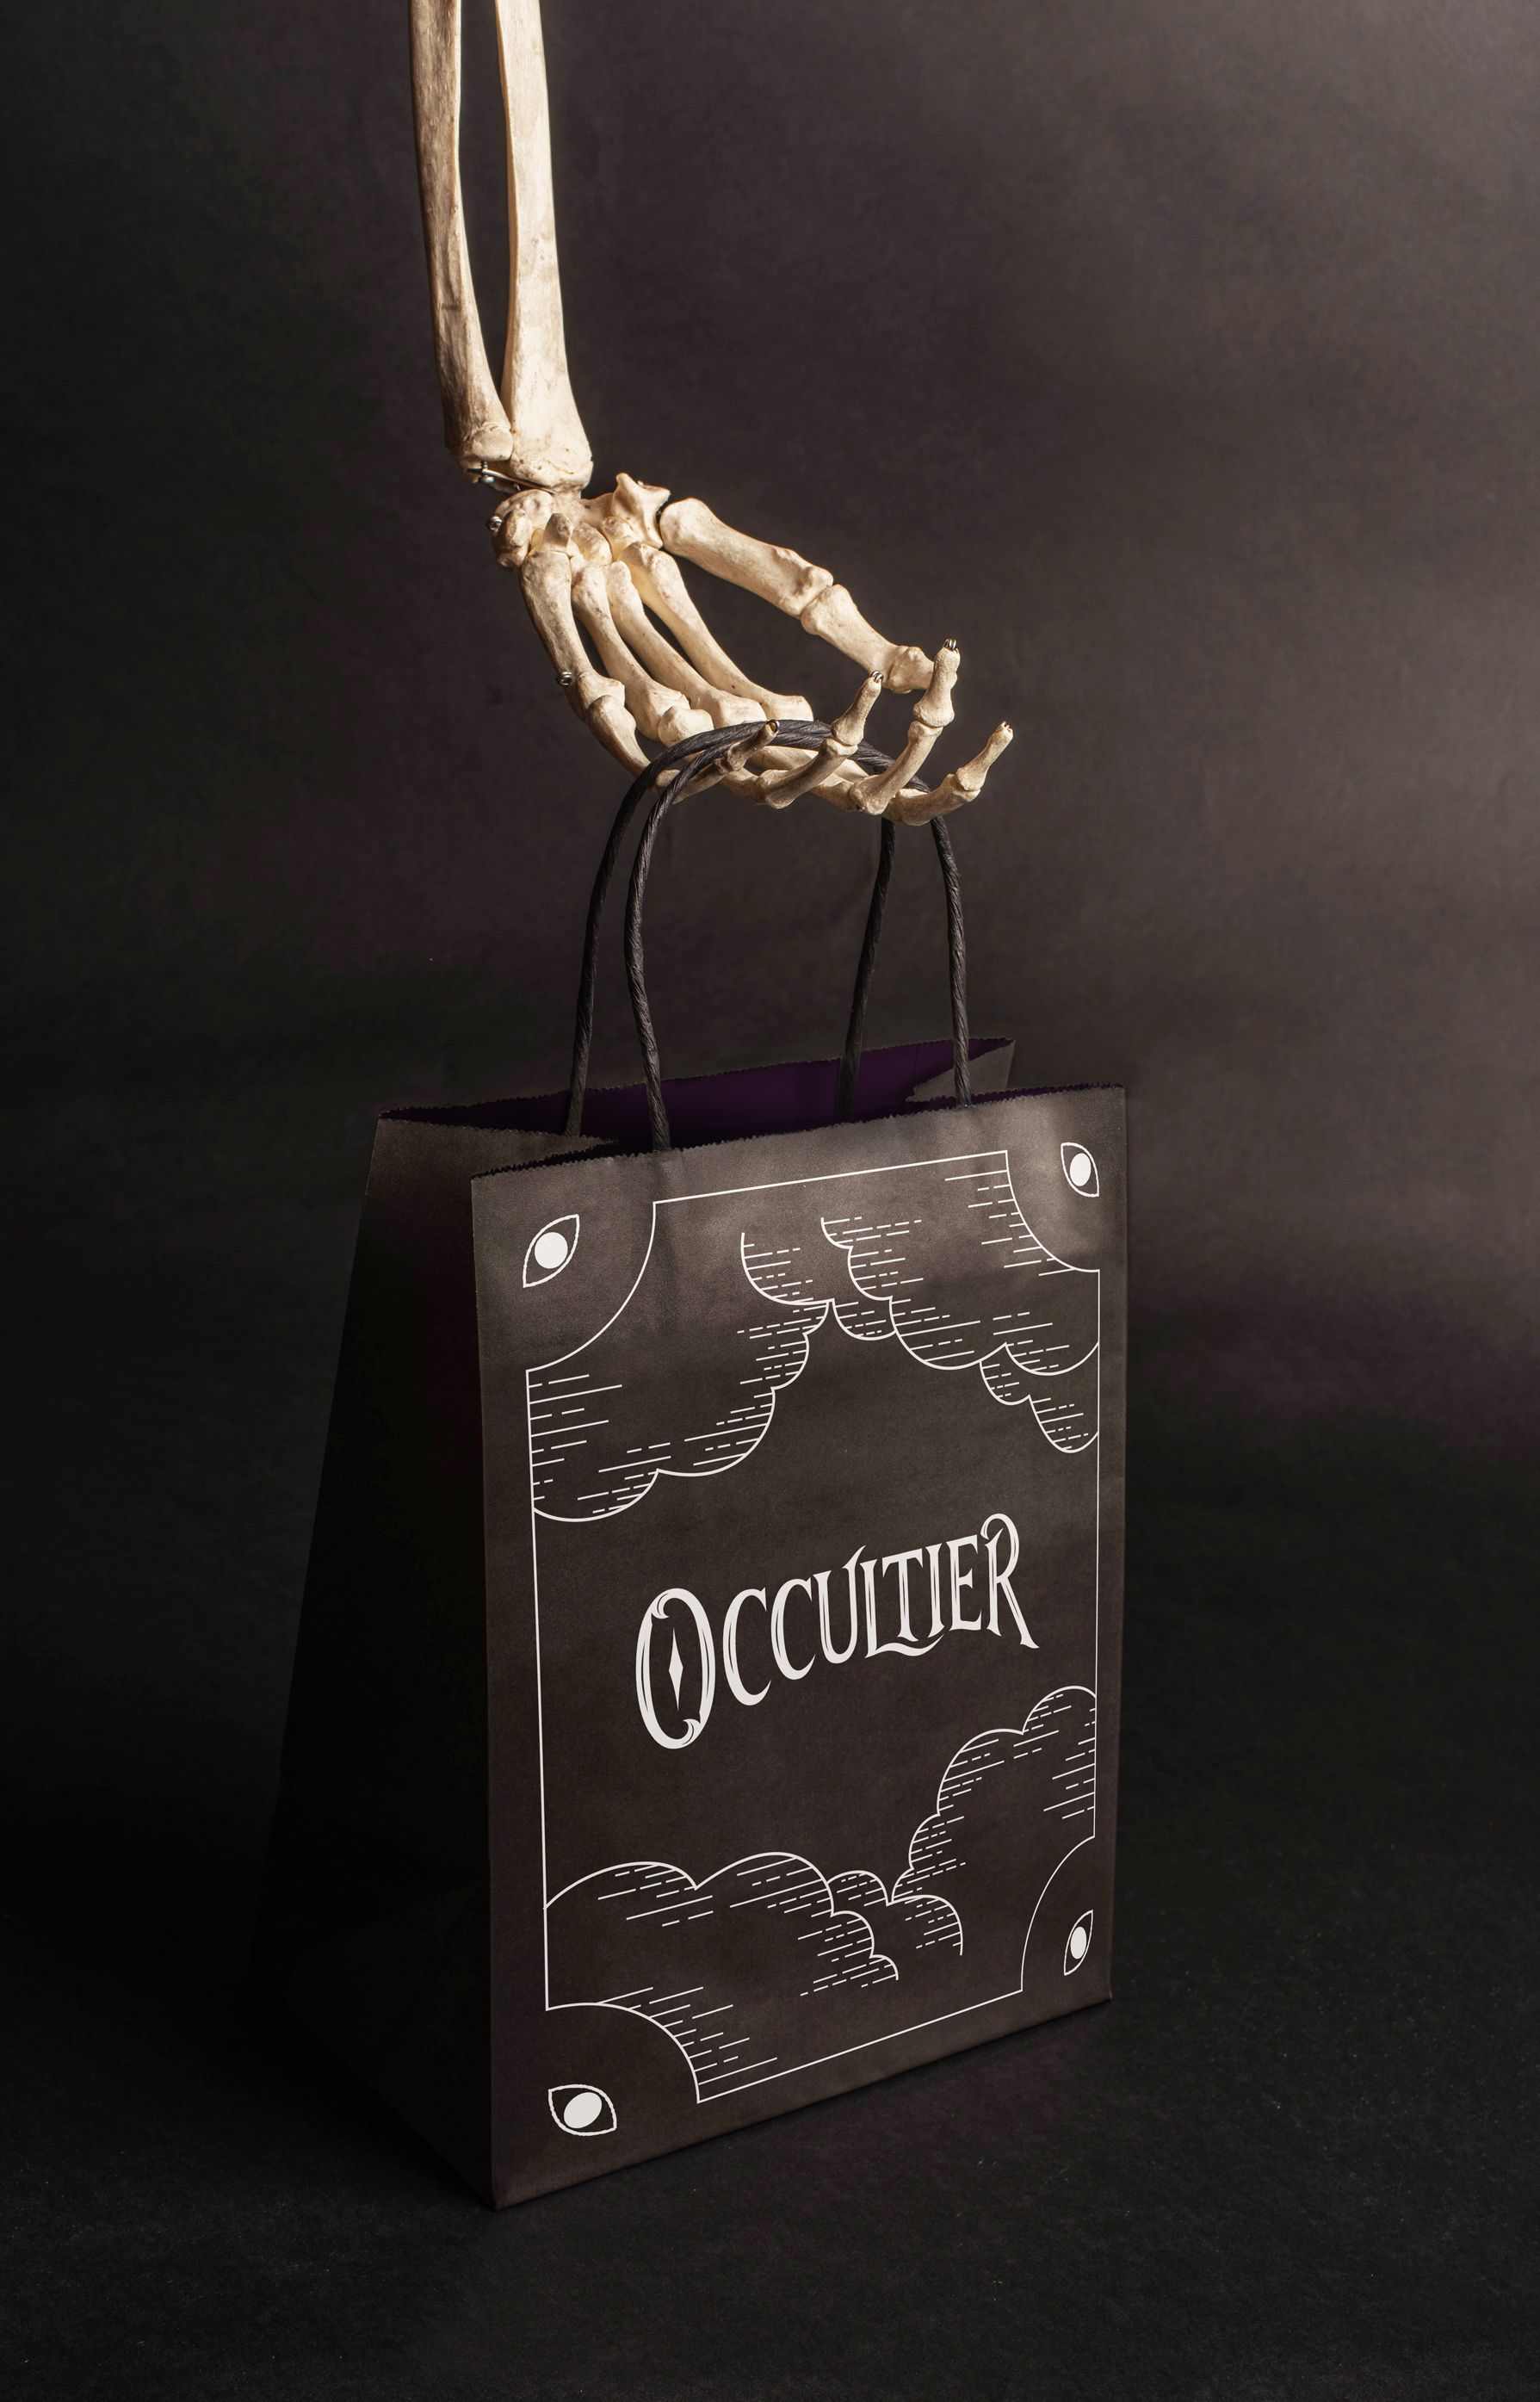 Occultier_bag.jpg